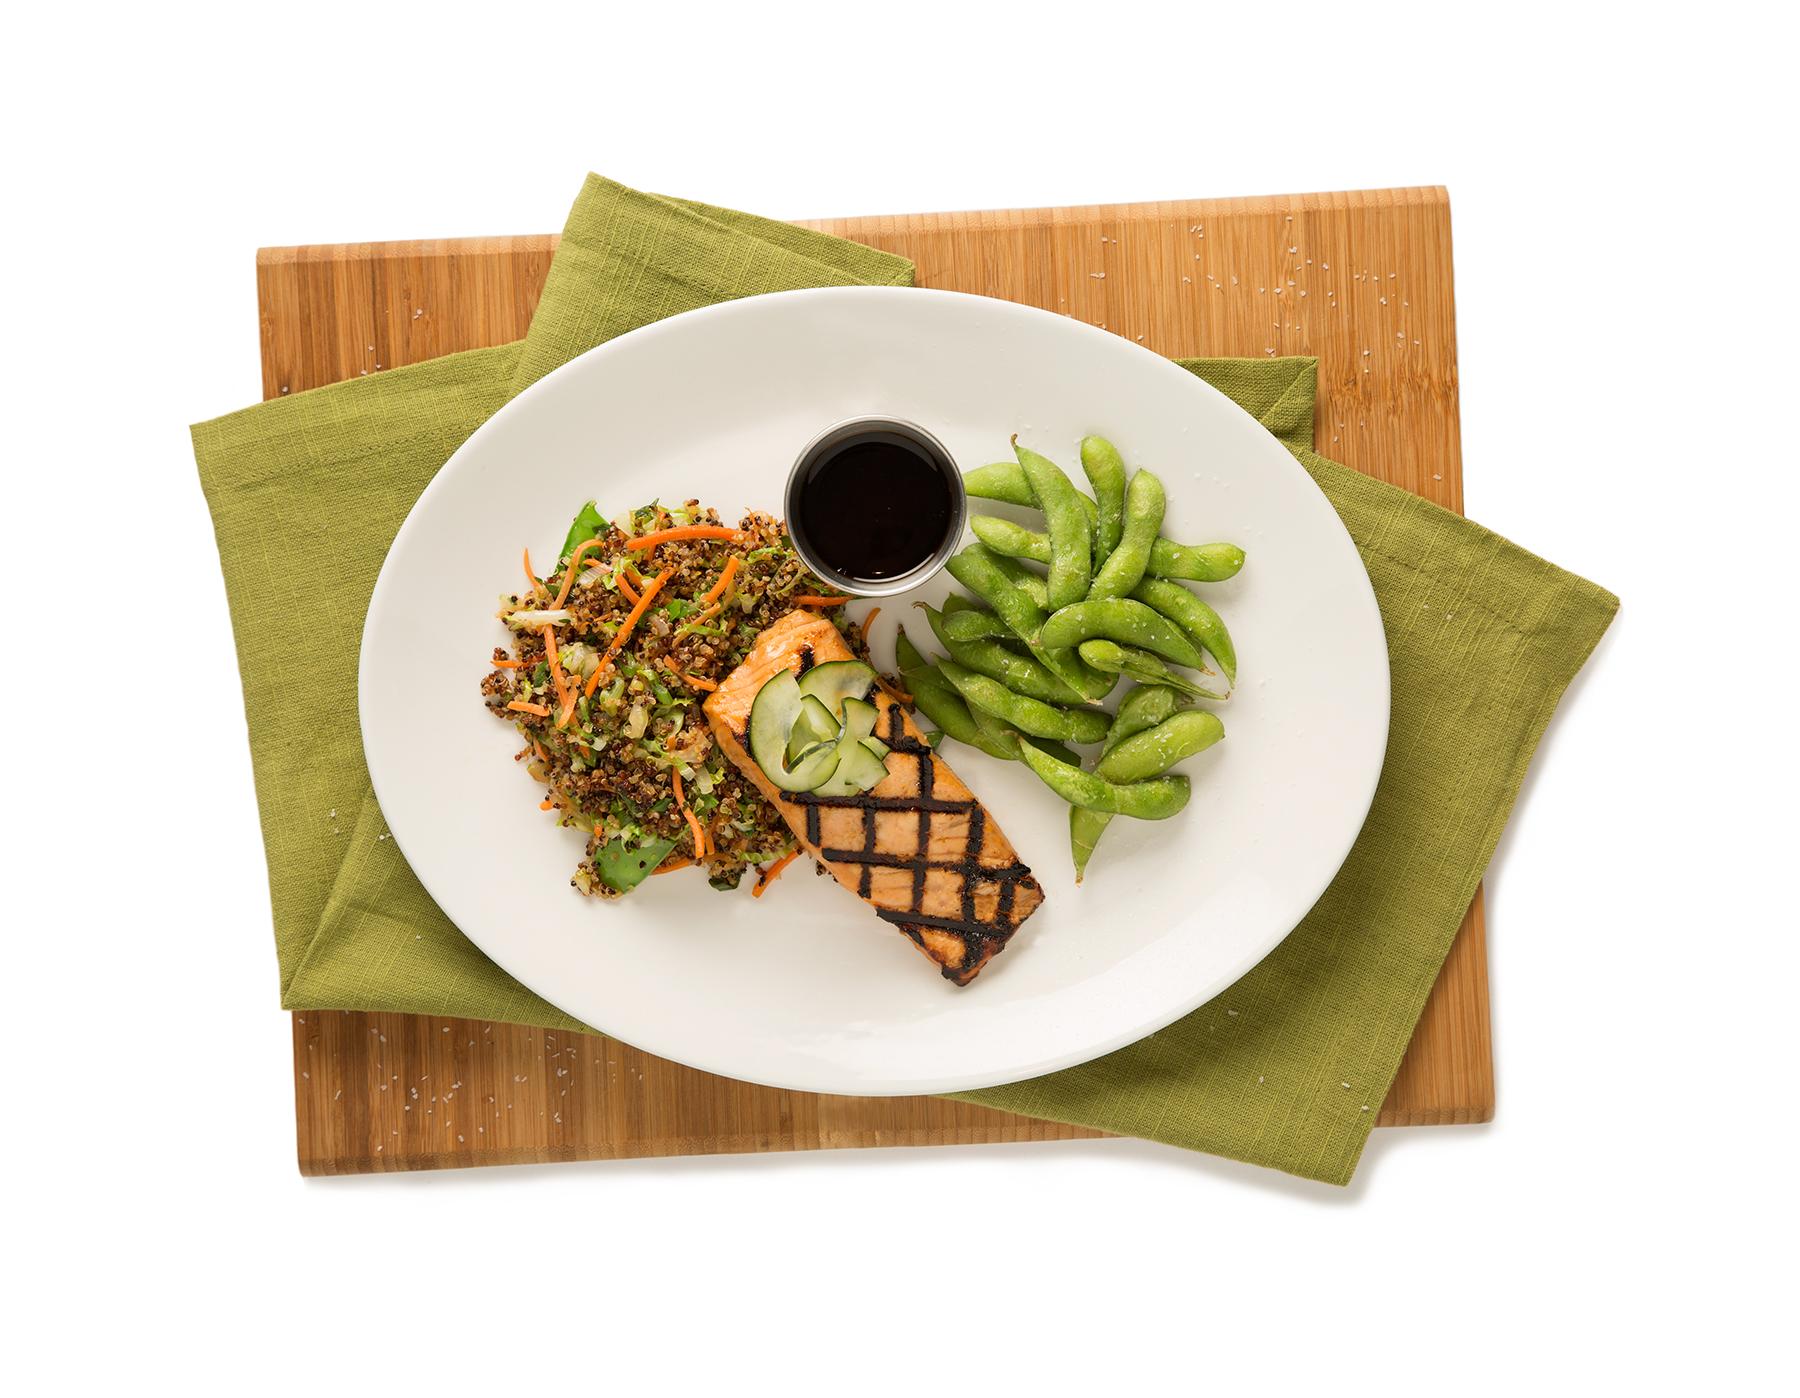 healthy salmon dish via dallasfoodnerd.com